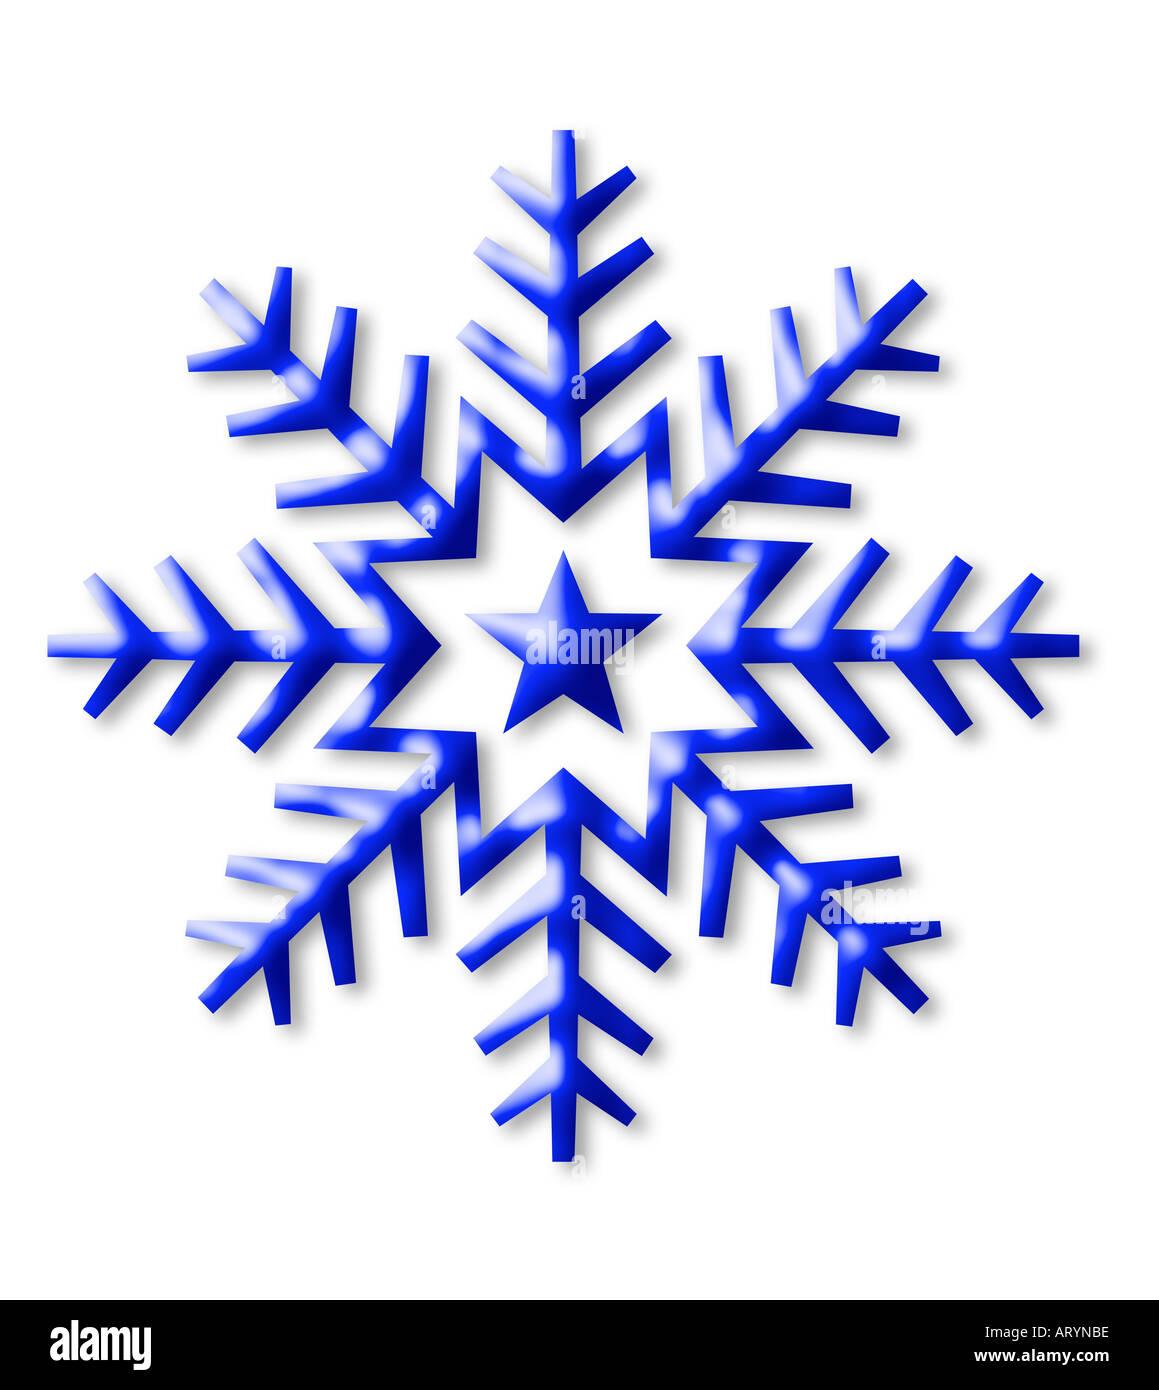 snow flake symbol, computer-illustration isolated on white - Stock Image